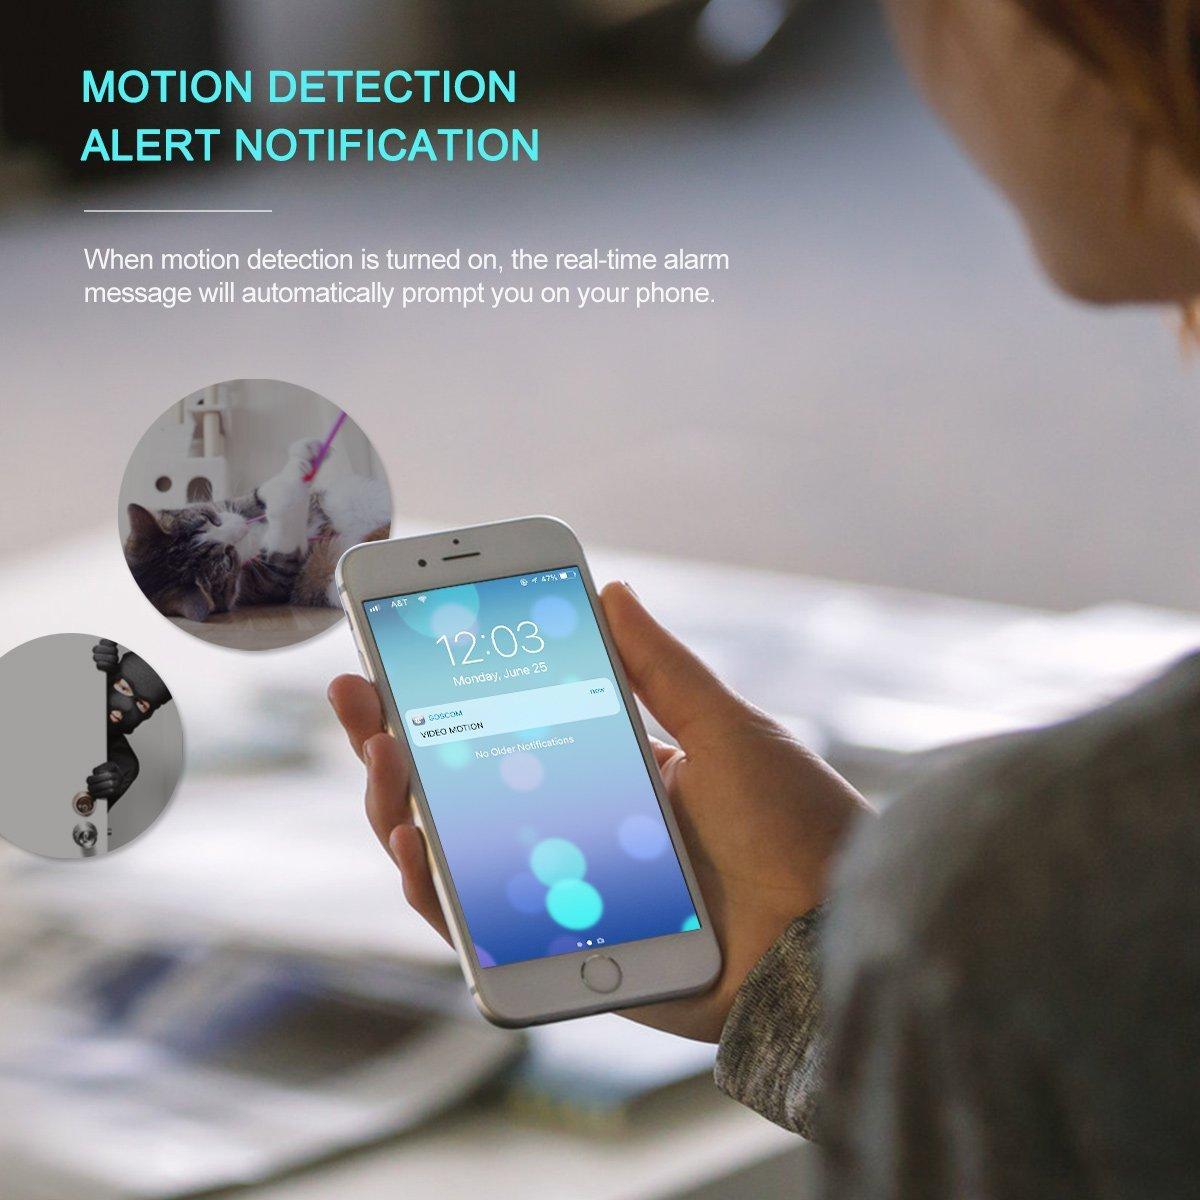 UNIOJO 360° Smart Home Indoor Security Camera 1080P IP Camera WiFi Wireless  Security Surveillance System Work with Alexa